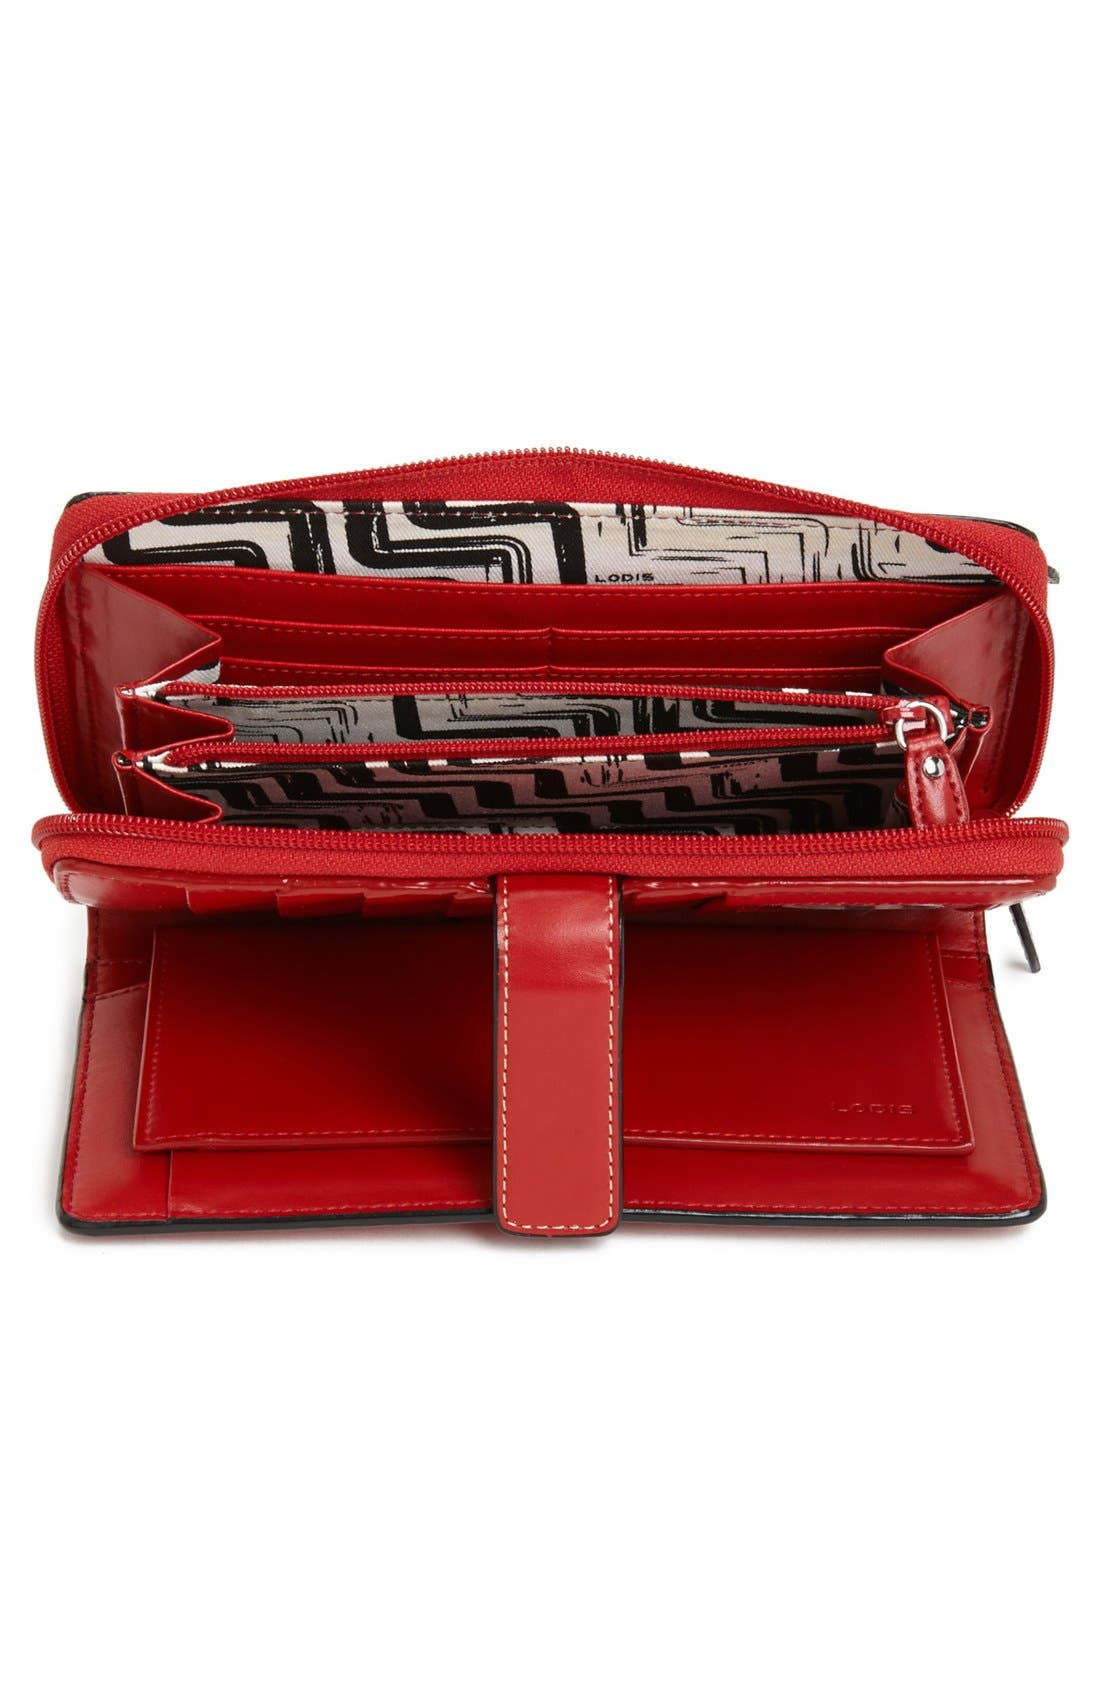 Alternate Image 2  - Lodis 'Audrey - Deluxe' Checkbook Clutch Wallet